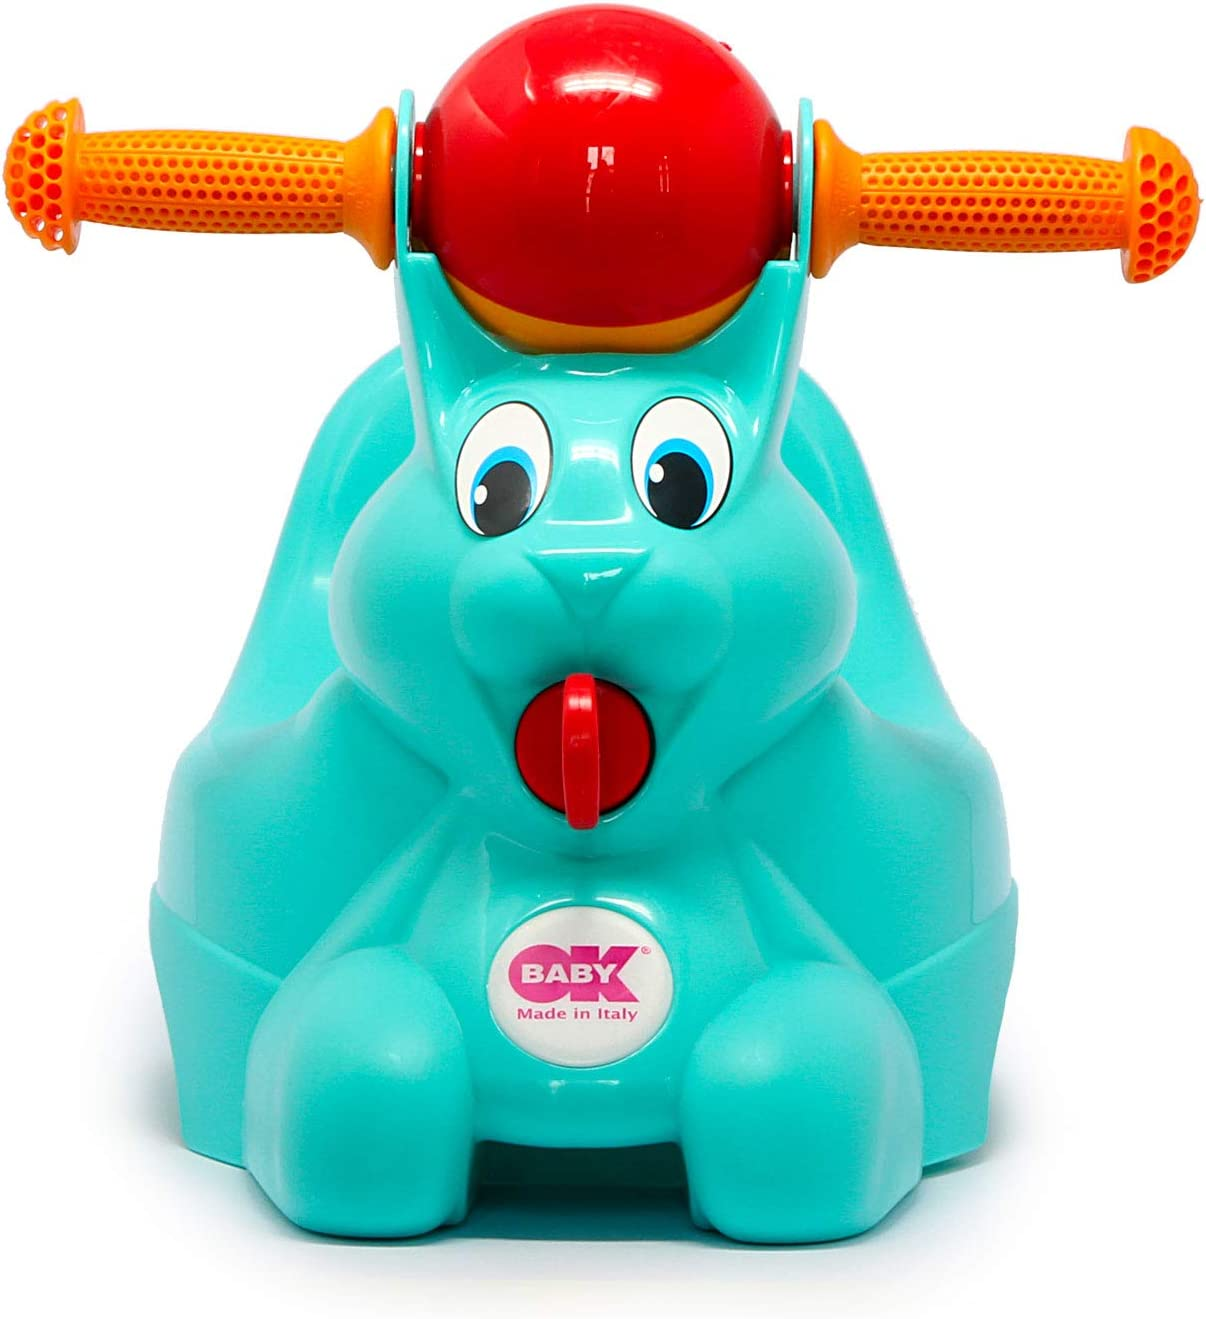 OK BABY Pot en Forme de Lapin Turquoise